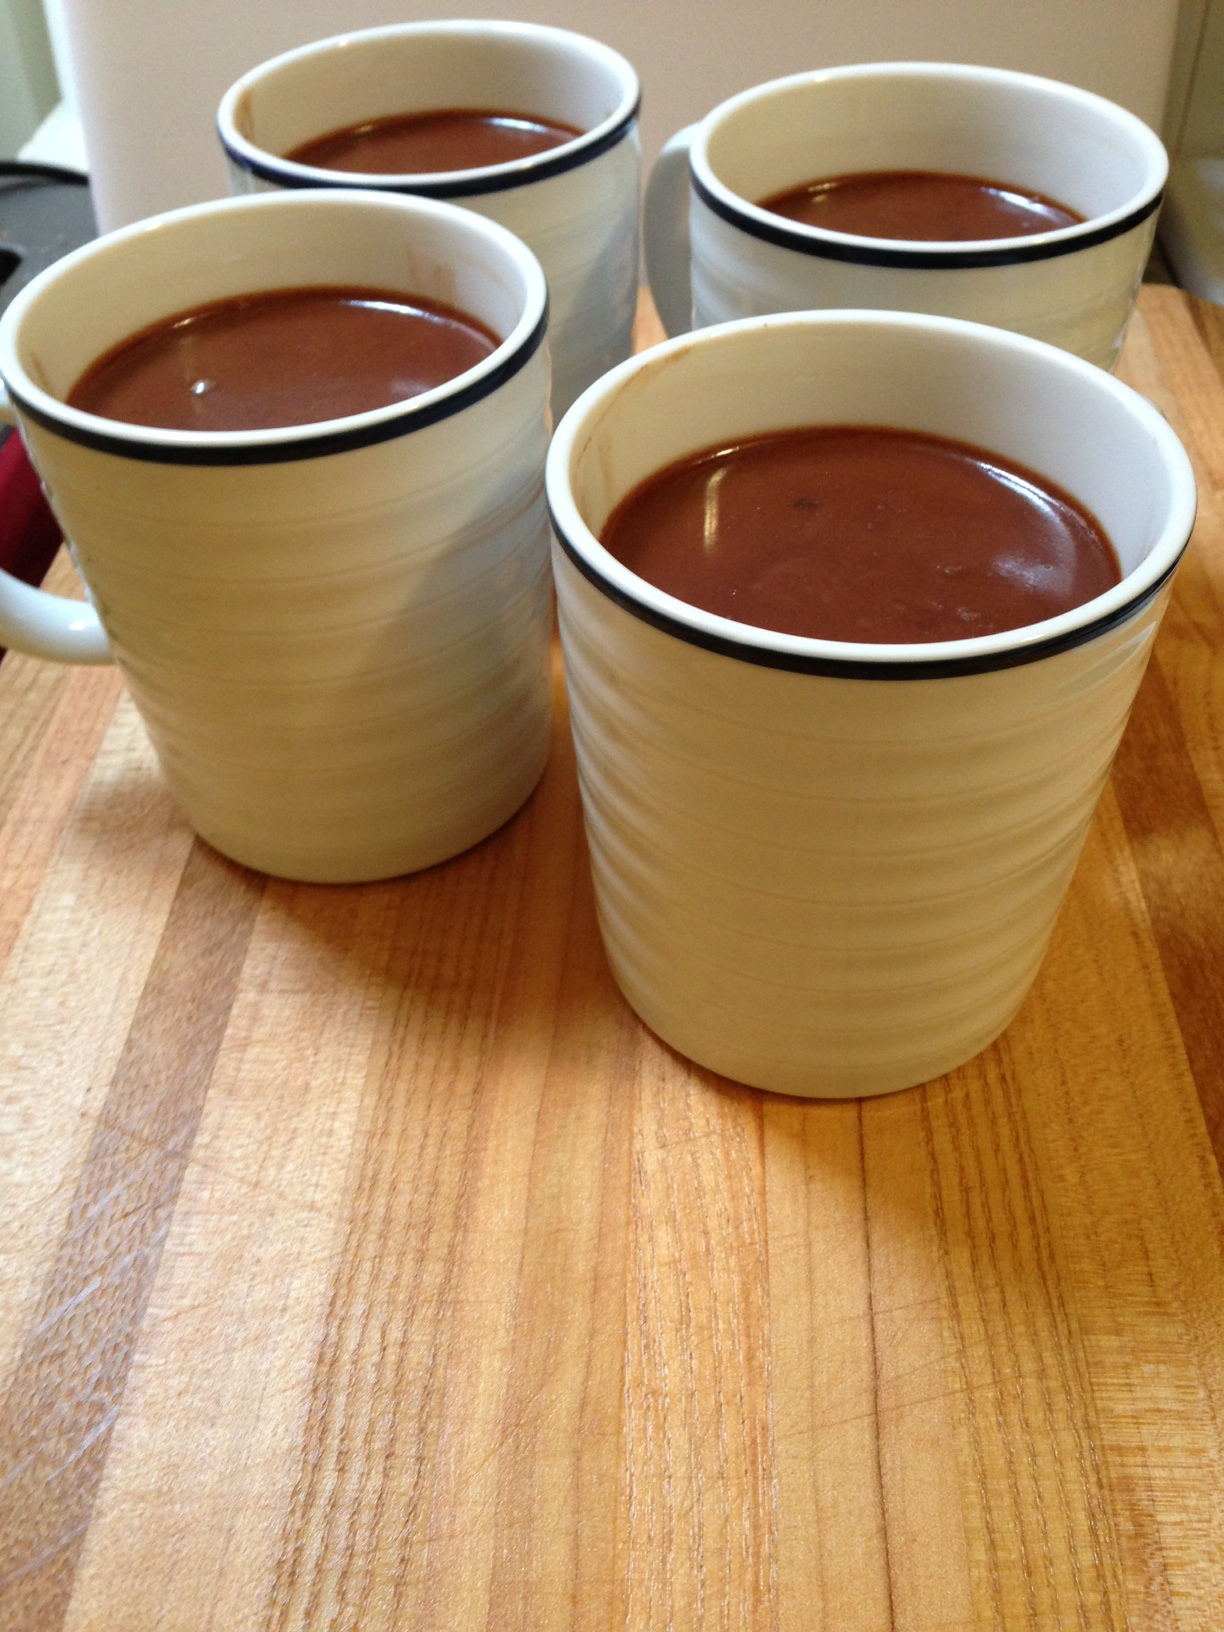 Chocolate Panna Cotta GoldfinchandScout.JPG